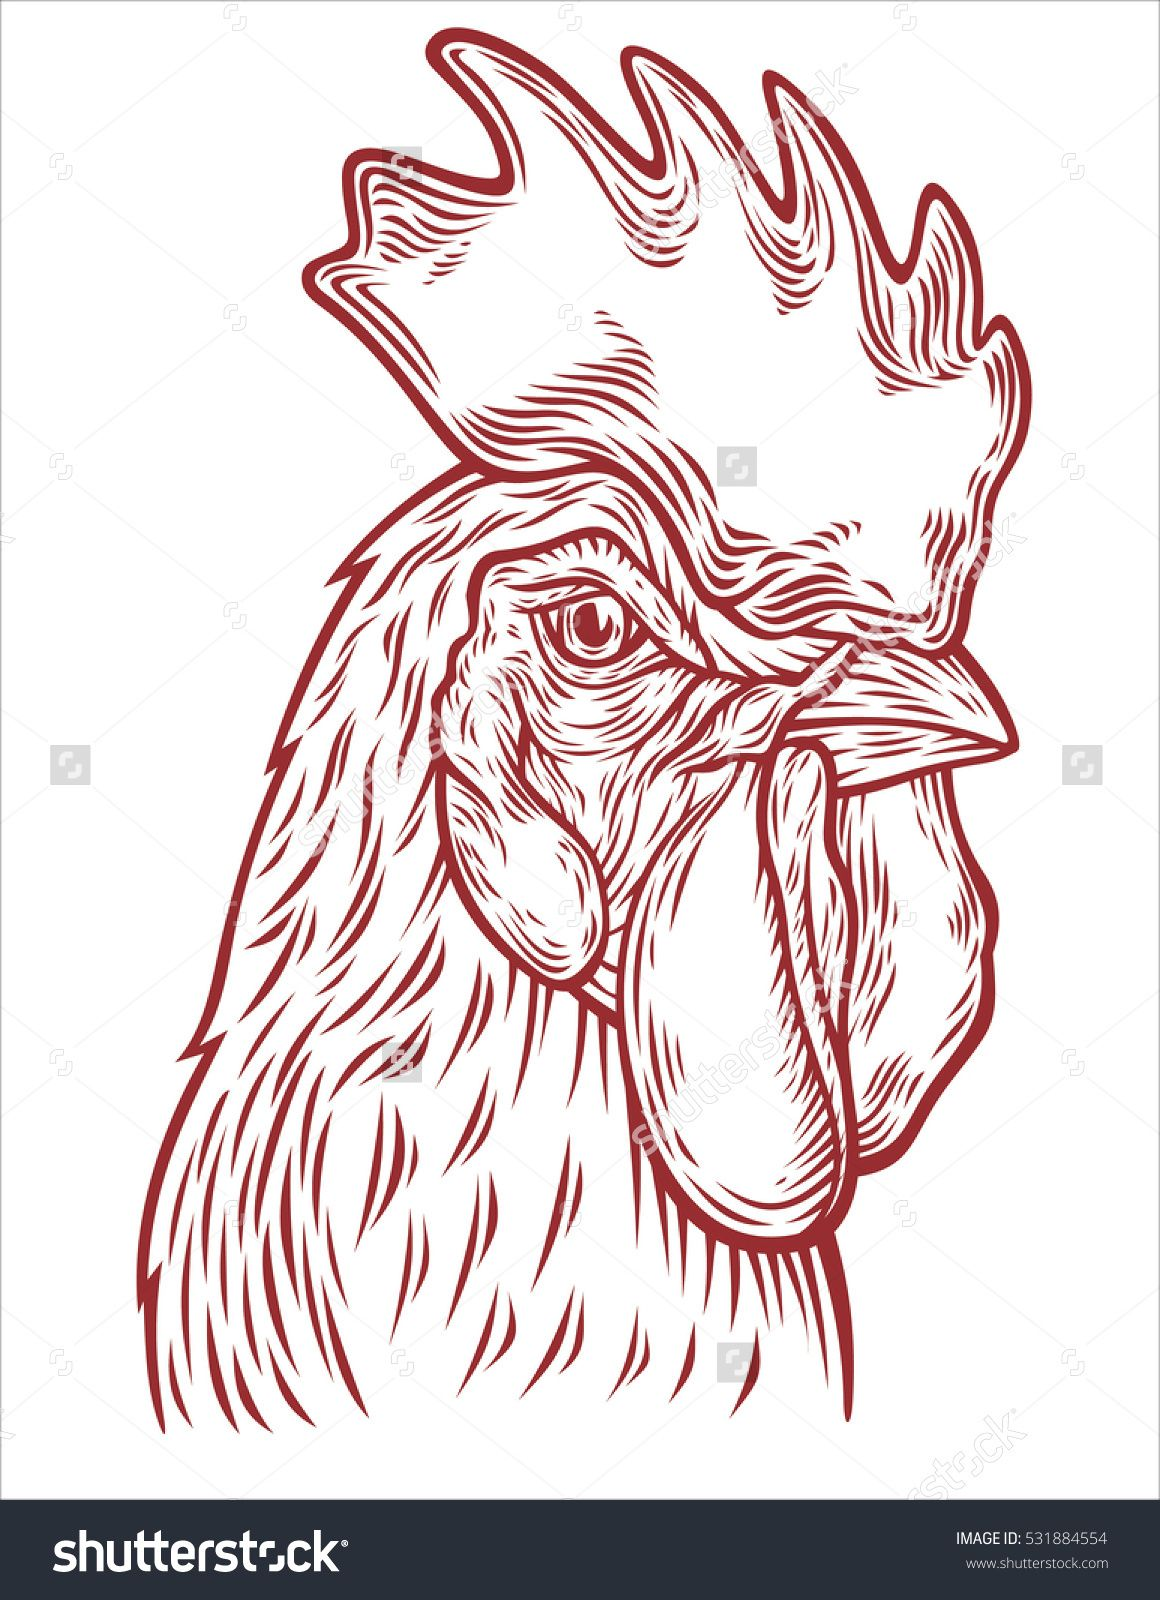 1160x1600 Hand Drawn Rooster Head Vector Illustration. Sketch Chicken